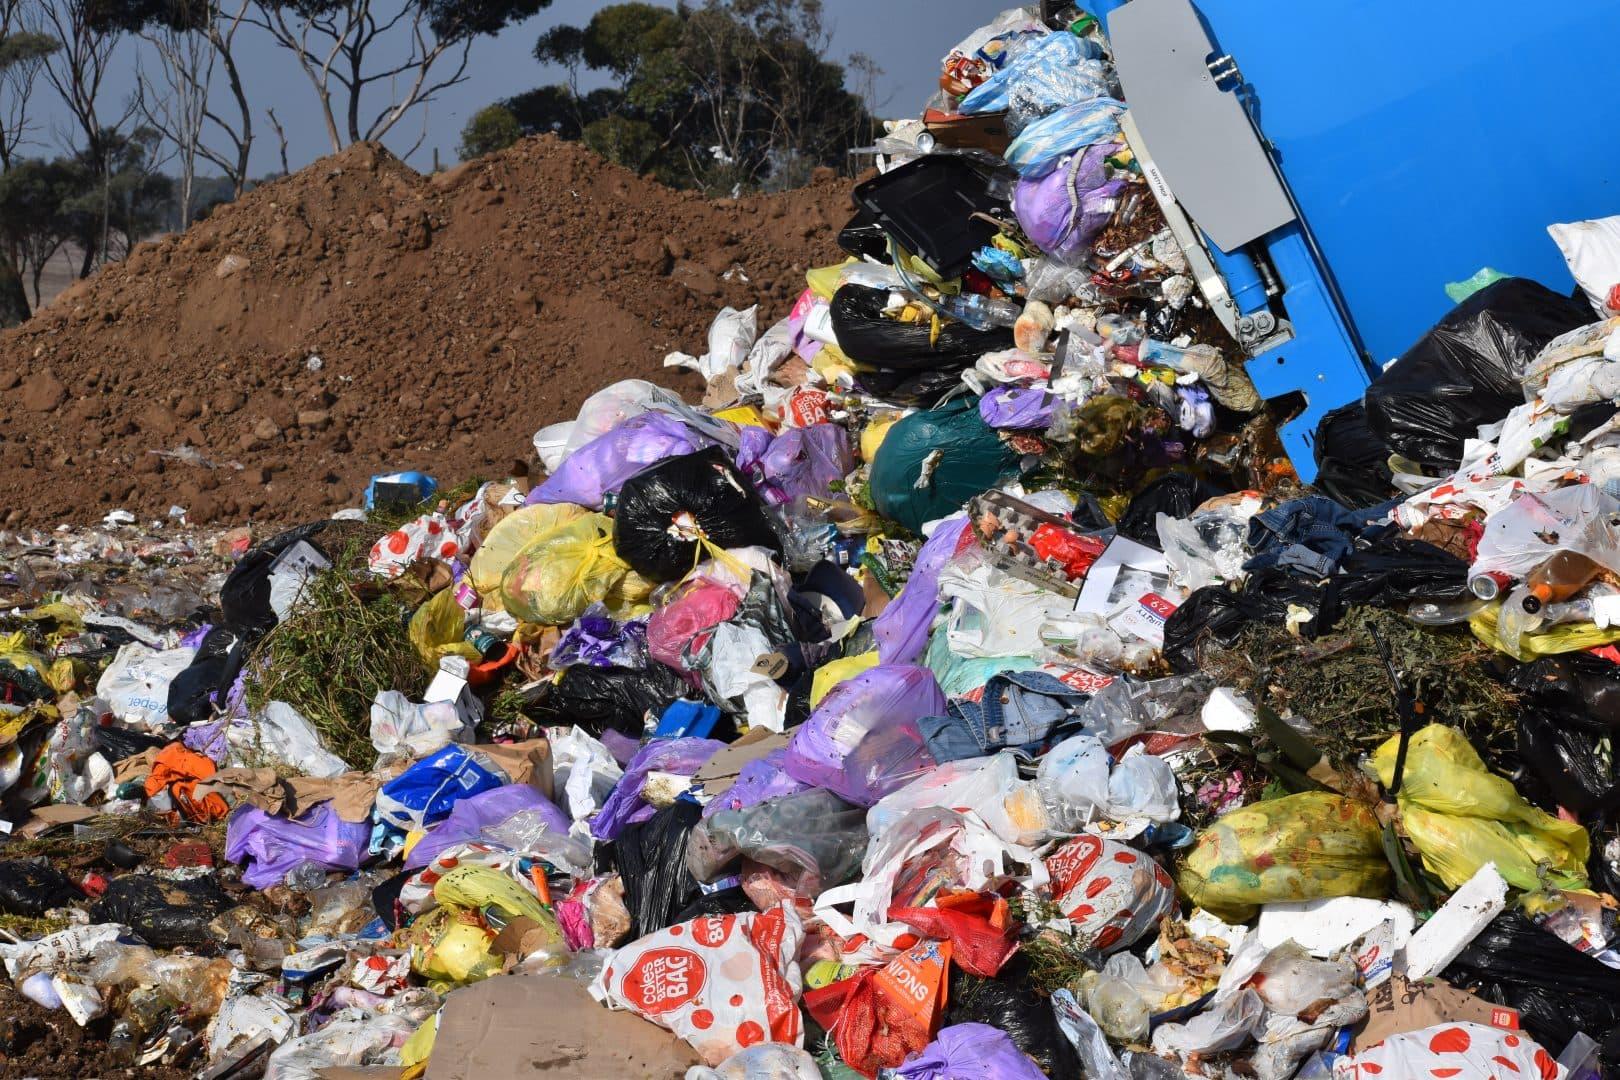 Wyndham City Landfill